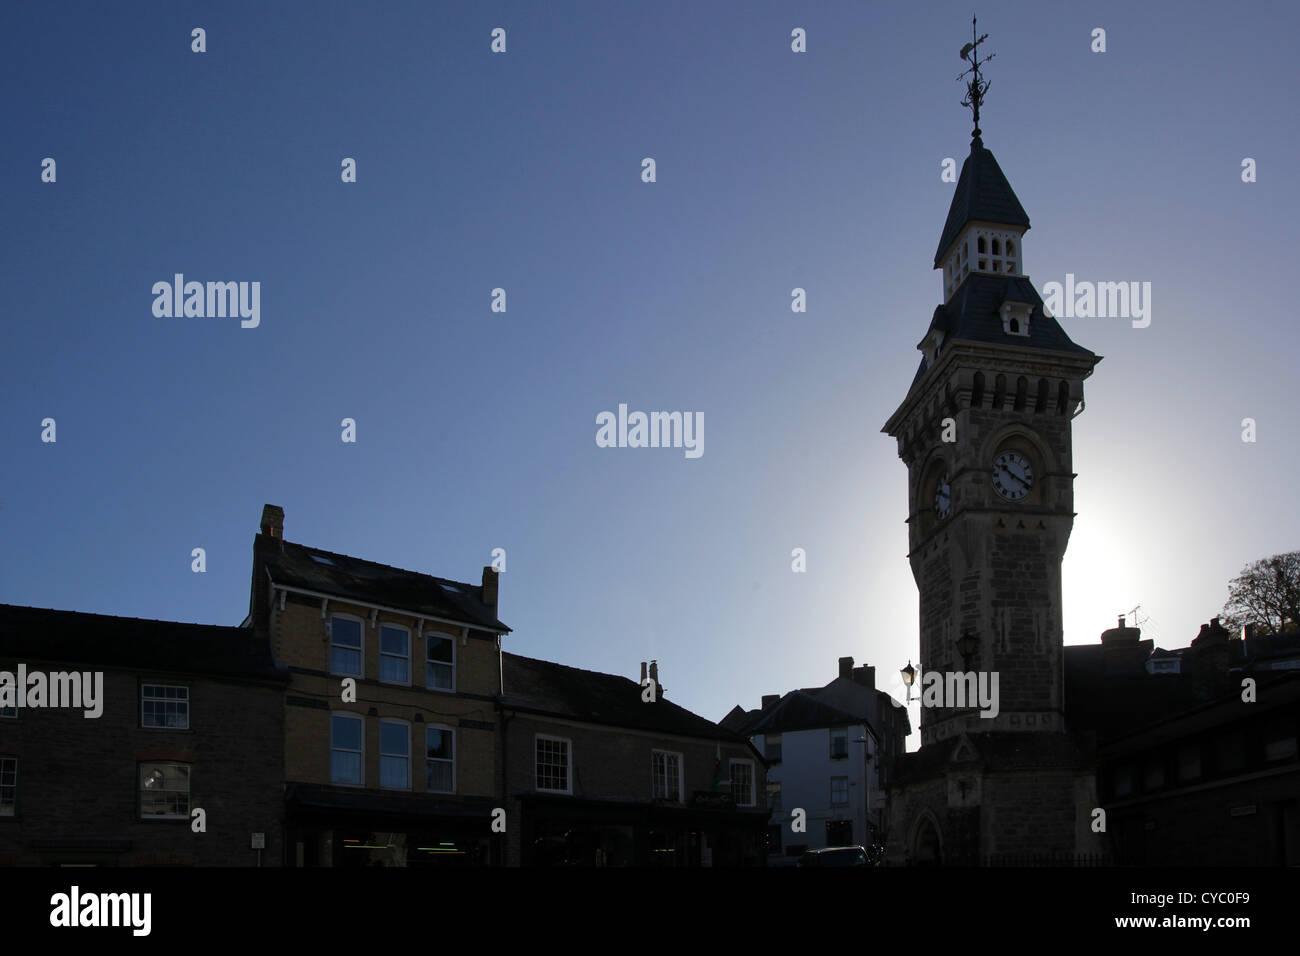 Clock tower, Hay on Wye, Powys, Wales, UK. - Stock Image